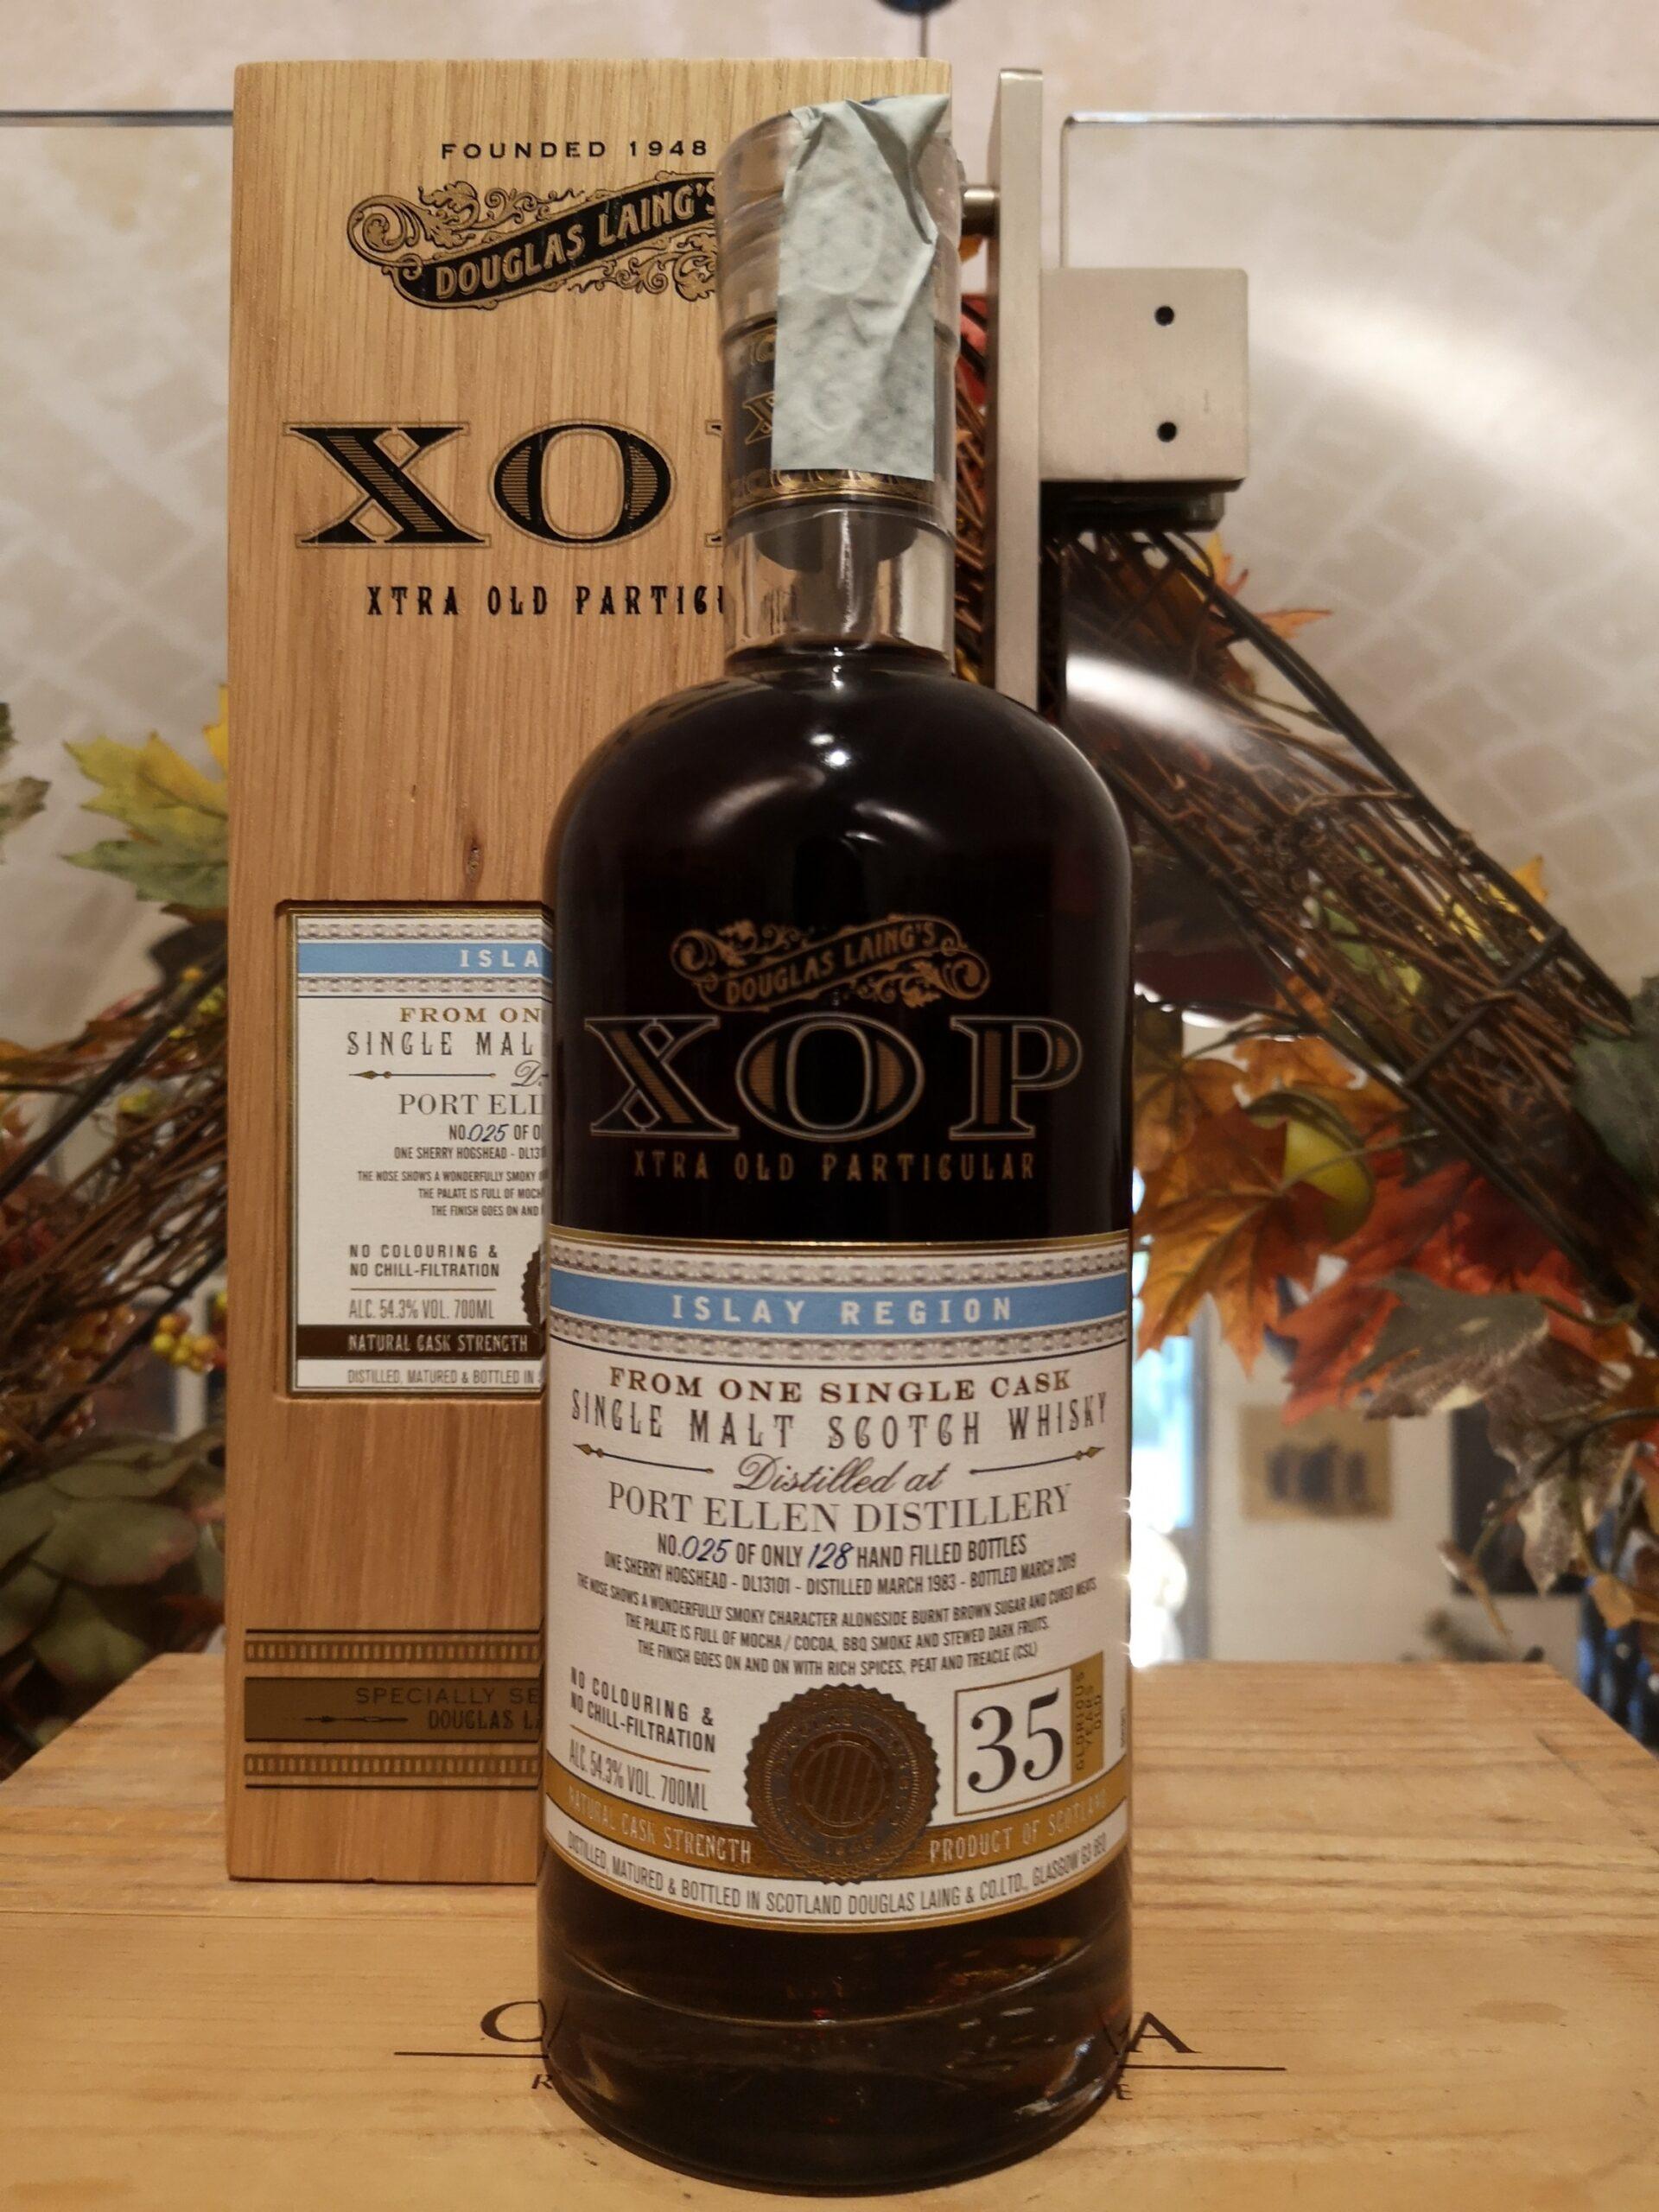 XOP Port Ellen Single Malt Scotch Whisky 1983 35 YO by Douglas Laing